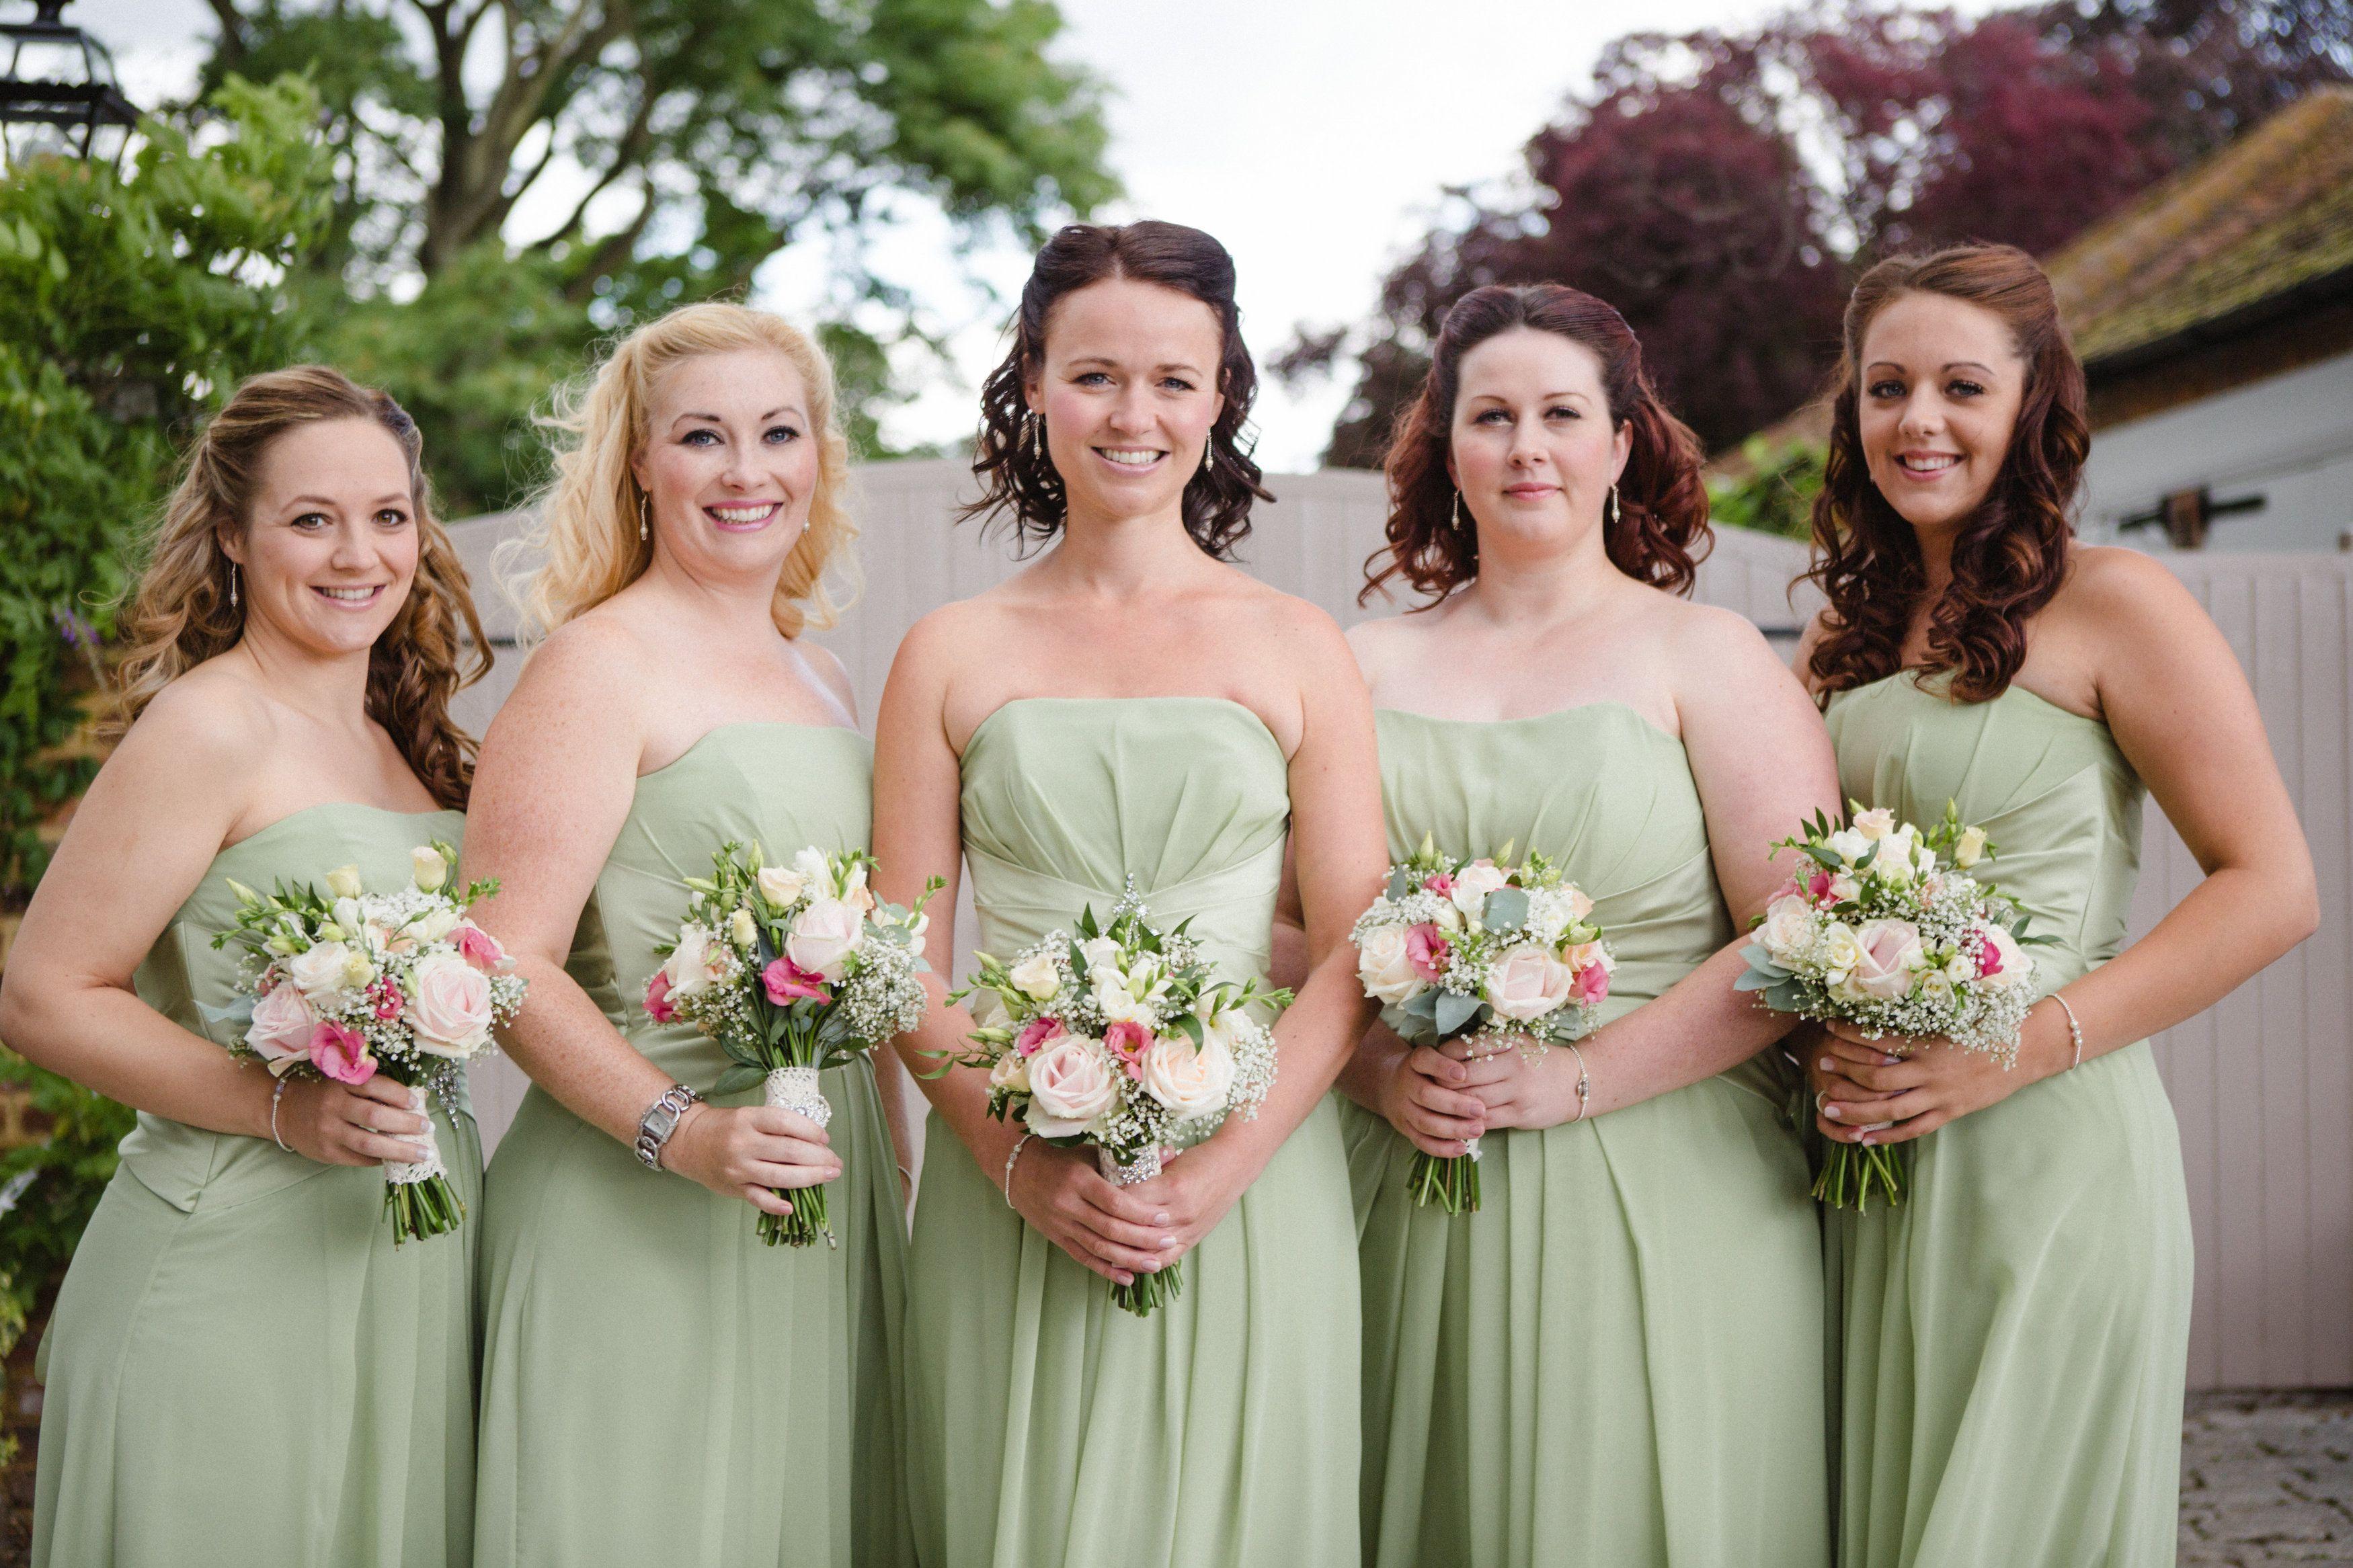 Green bridesmaids dresses ebony rose monica in pistachio green bridesmaids dresses ebony rose monica in pistachio ombrellifo Image collections